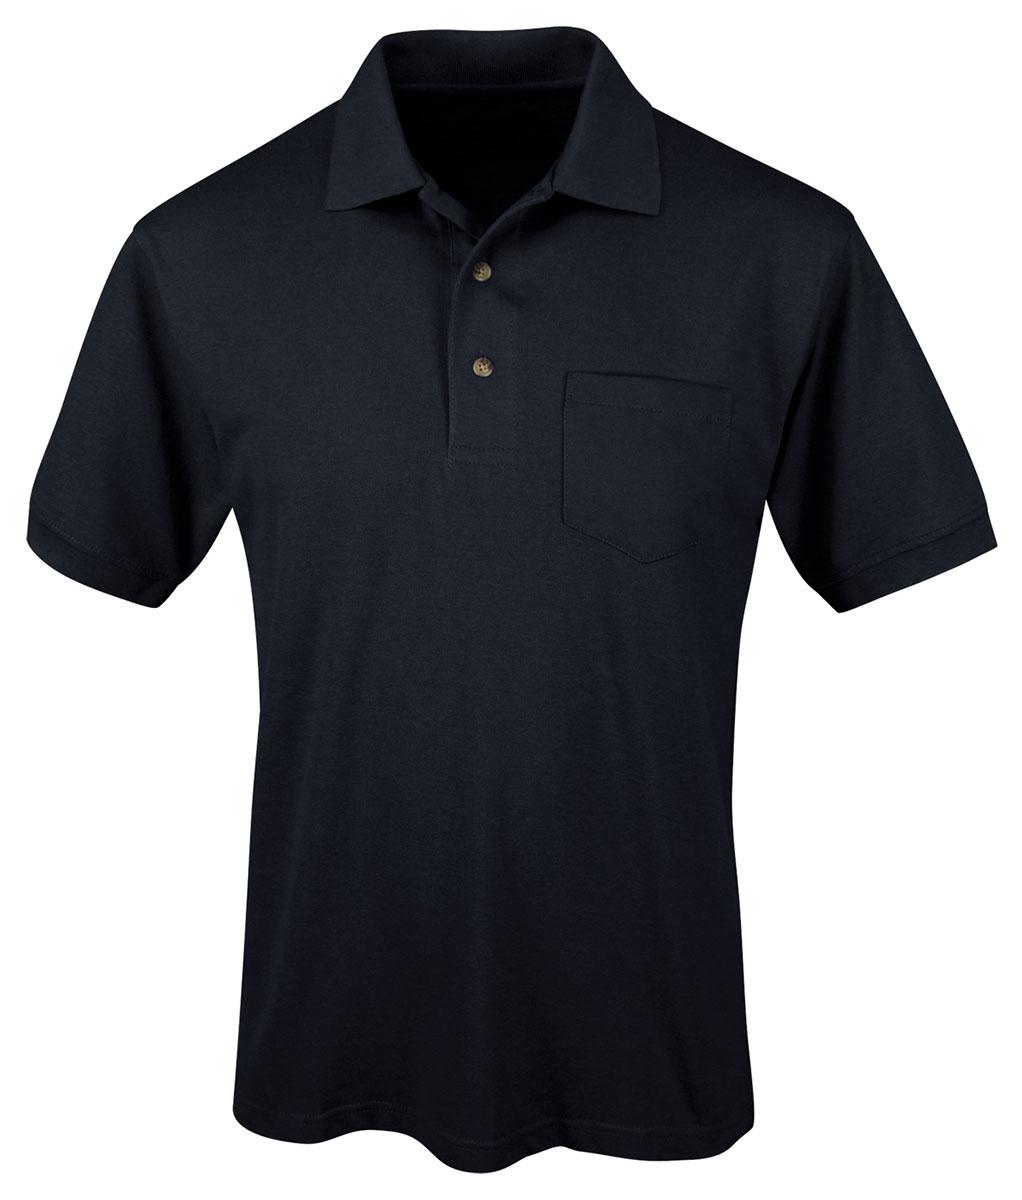 Tri-Mountain-Men-039-s-Short-Sleeve-Chest-Pocket-Sport-Pique-Polo-T-Shirt-S-XL-096